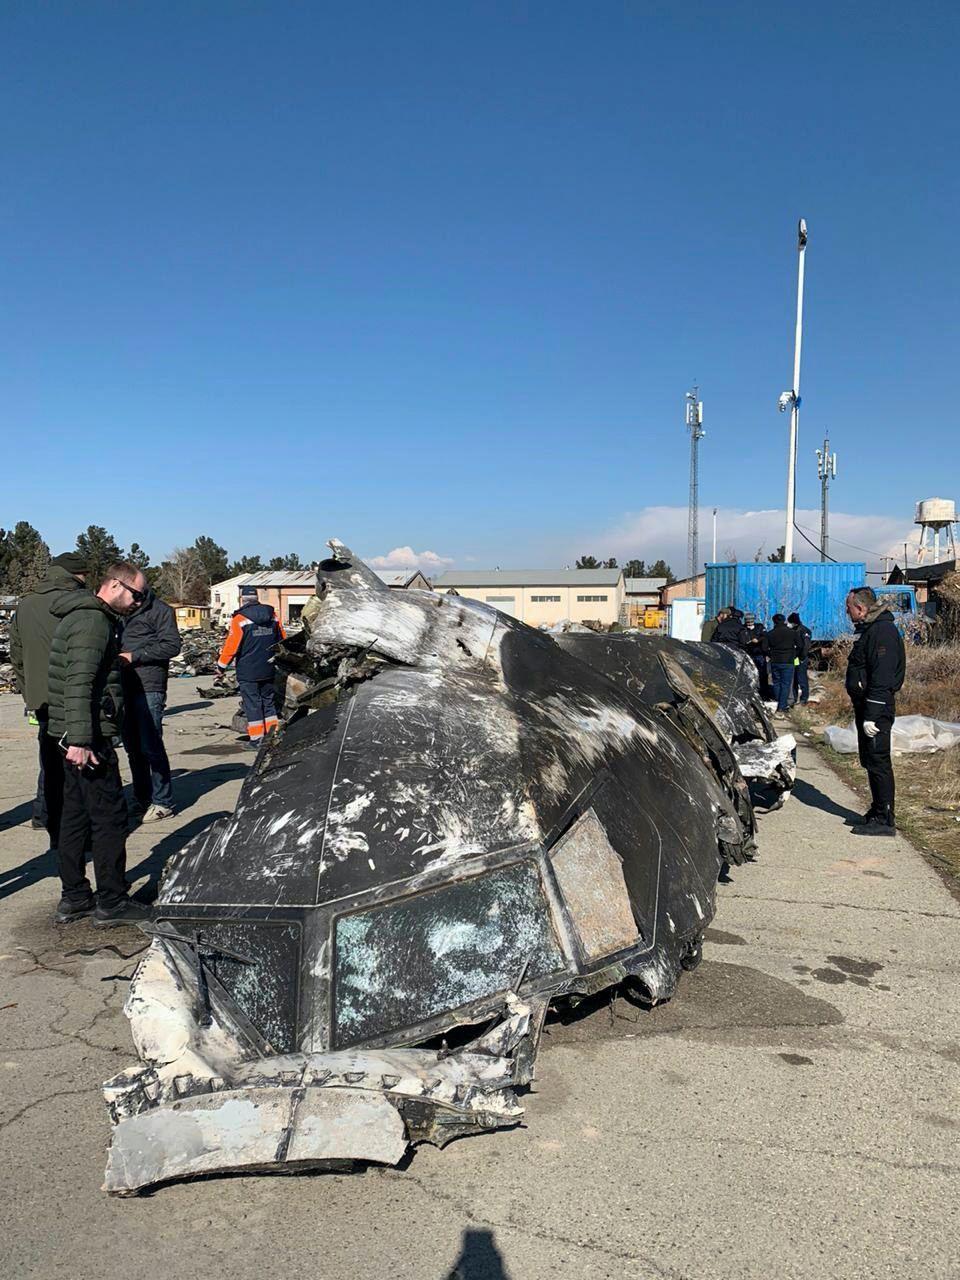 Ukraine International Airlines plane crashes near Tehran with over 170 people on board, Kiev - 11 Jan 2020